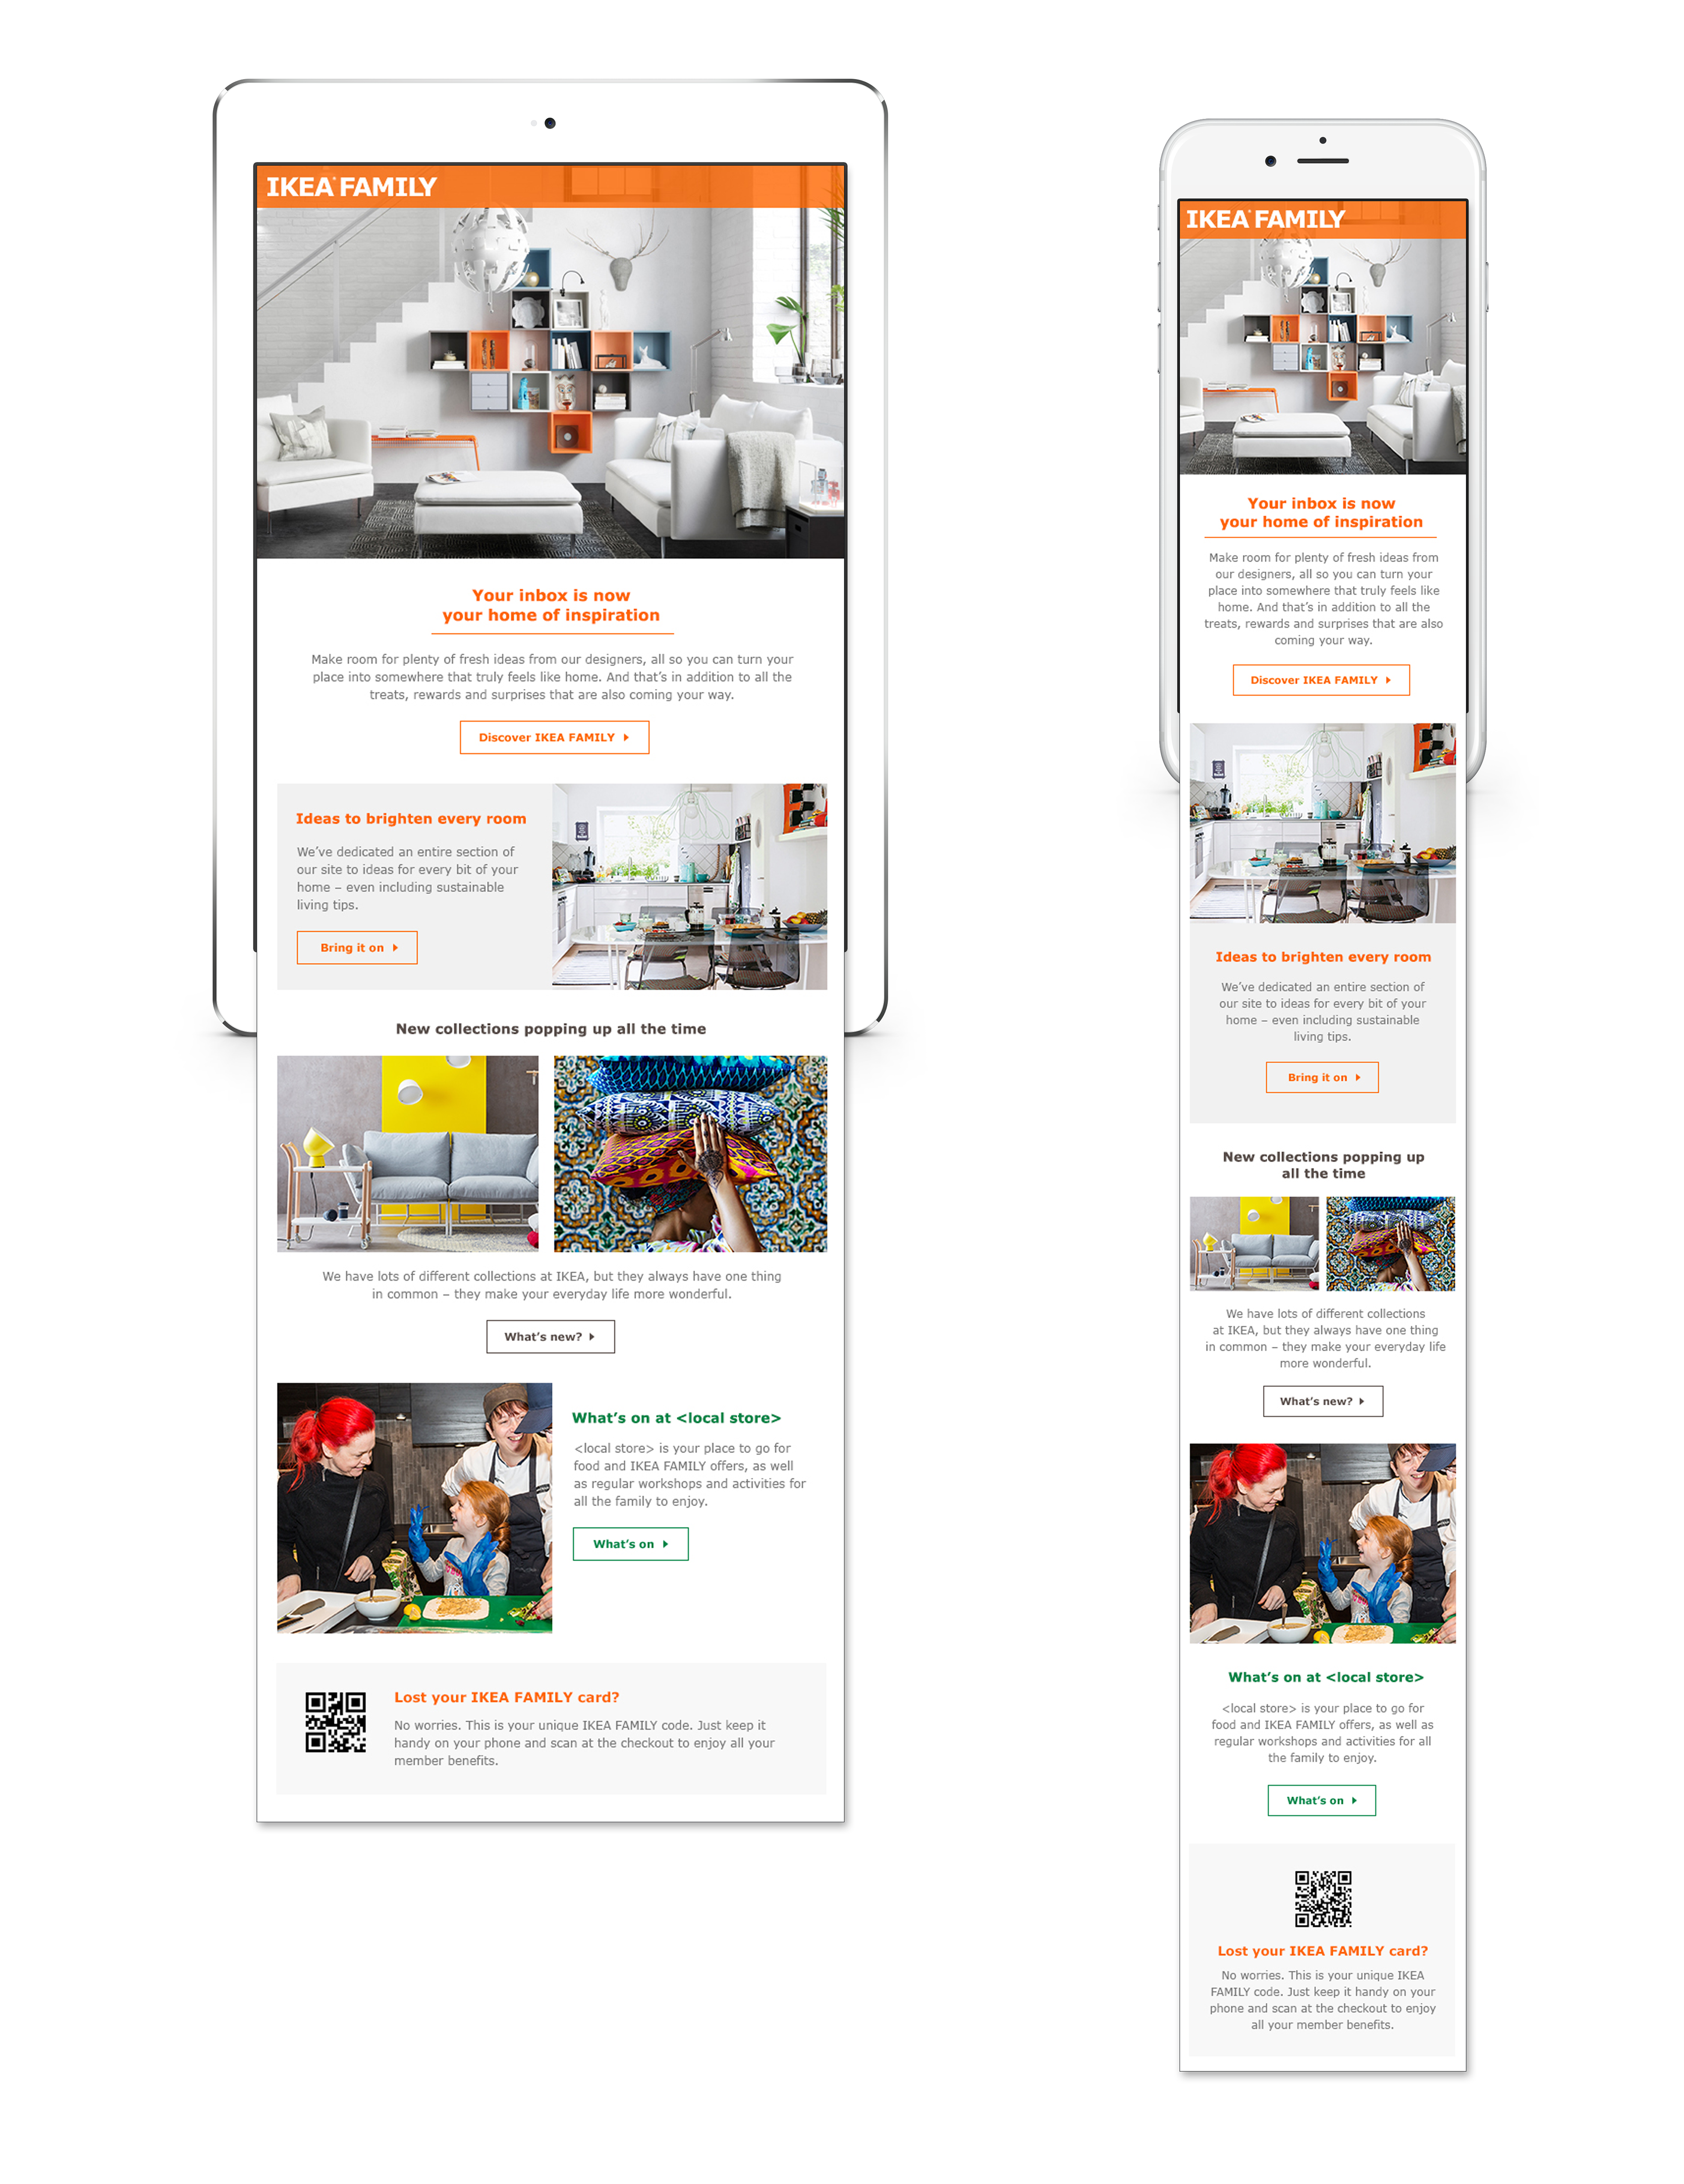 Schön Ikea Family Card Online Design